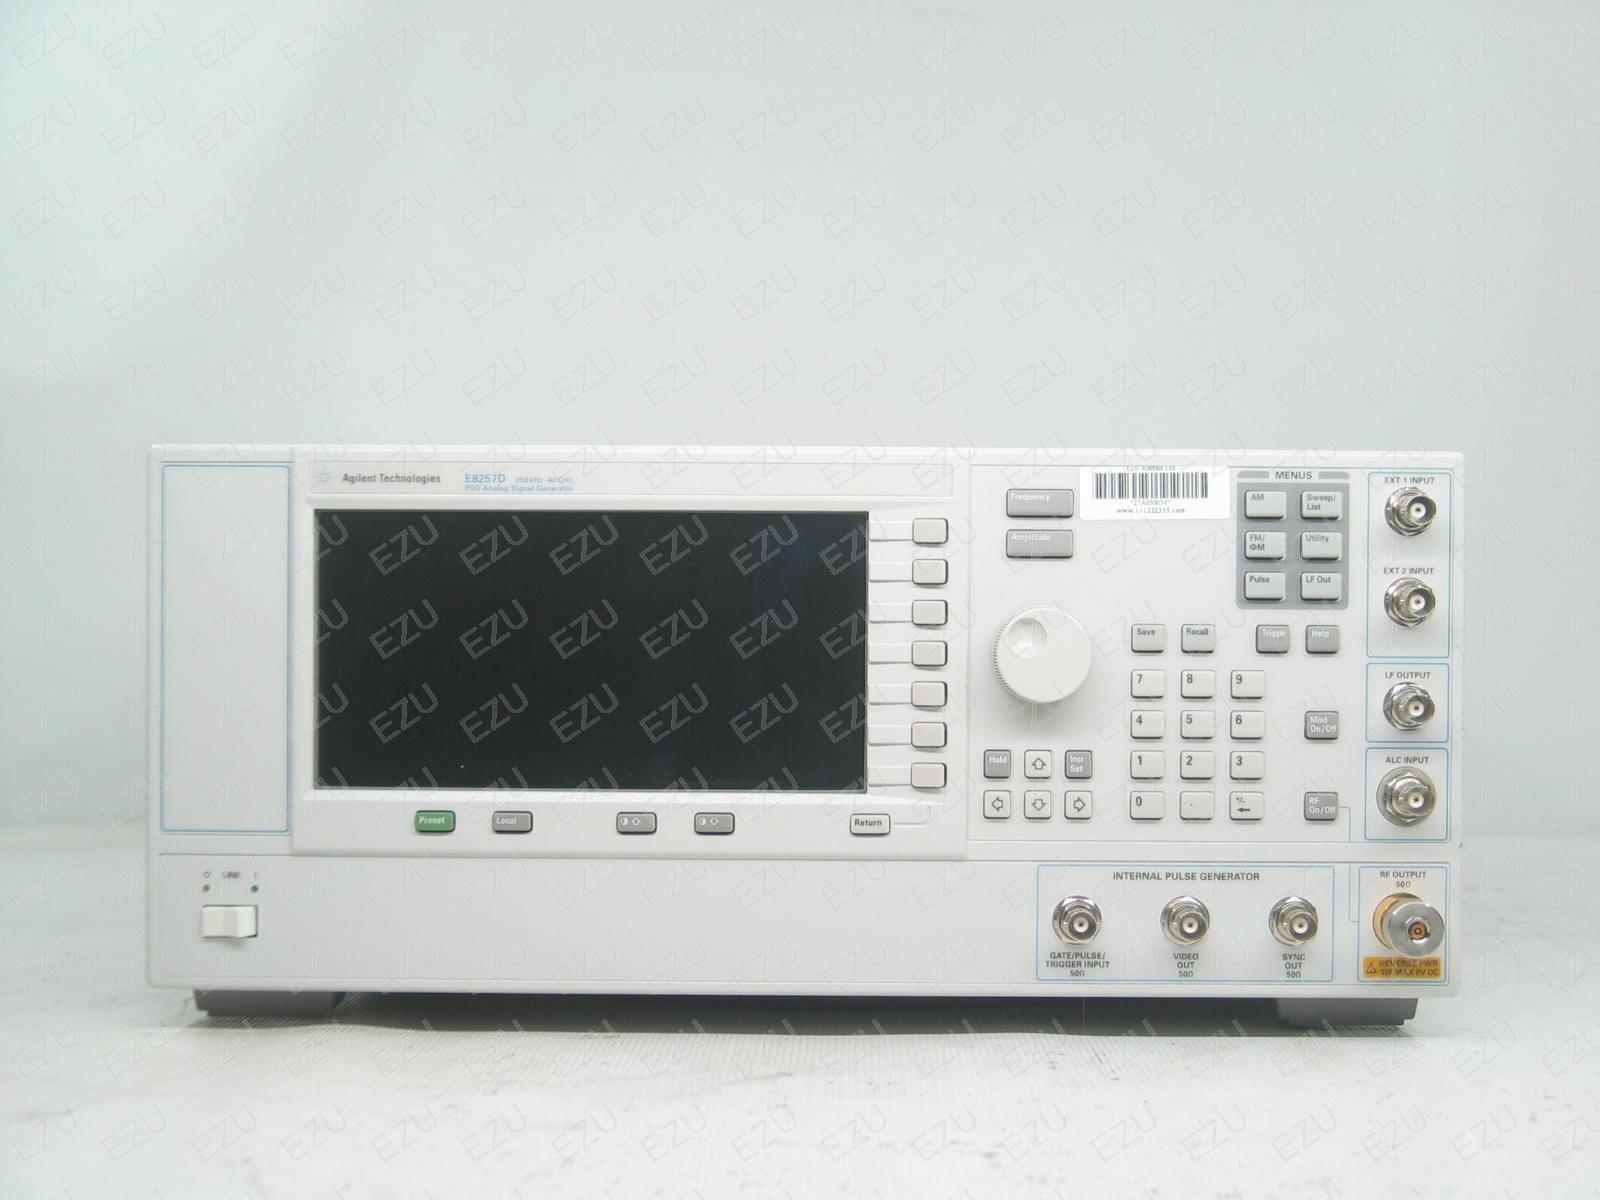 Keysight E8257D 007 - 540 - UNT - UNW - UNY